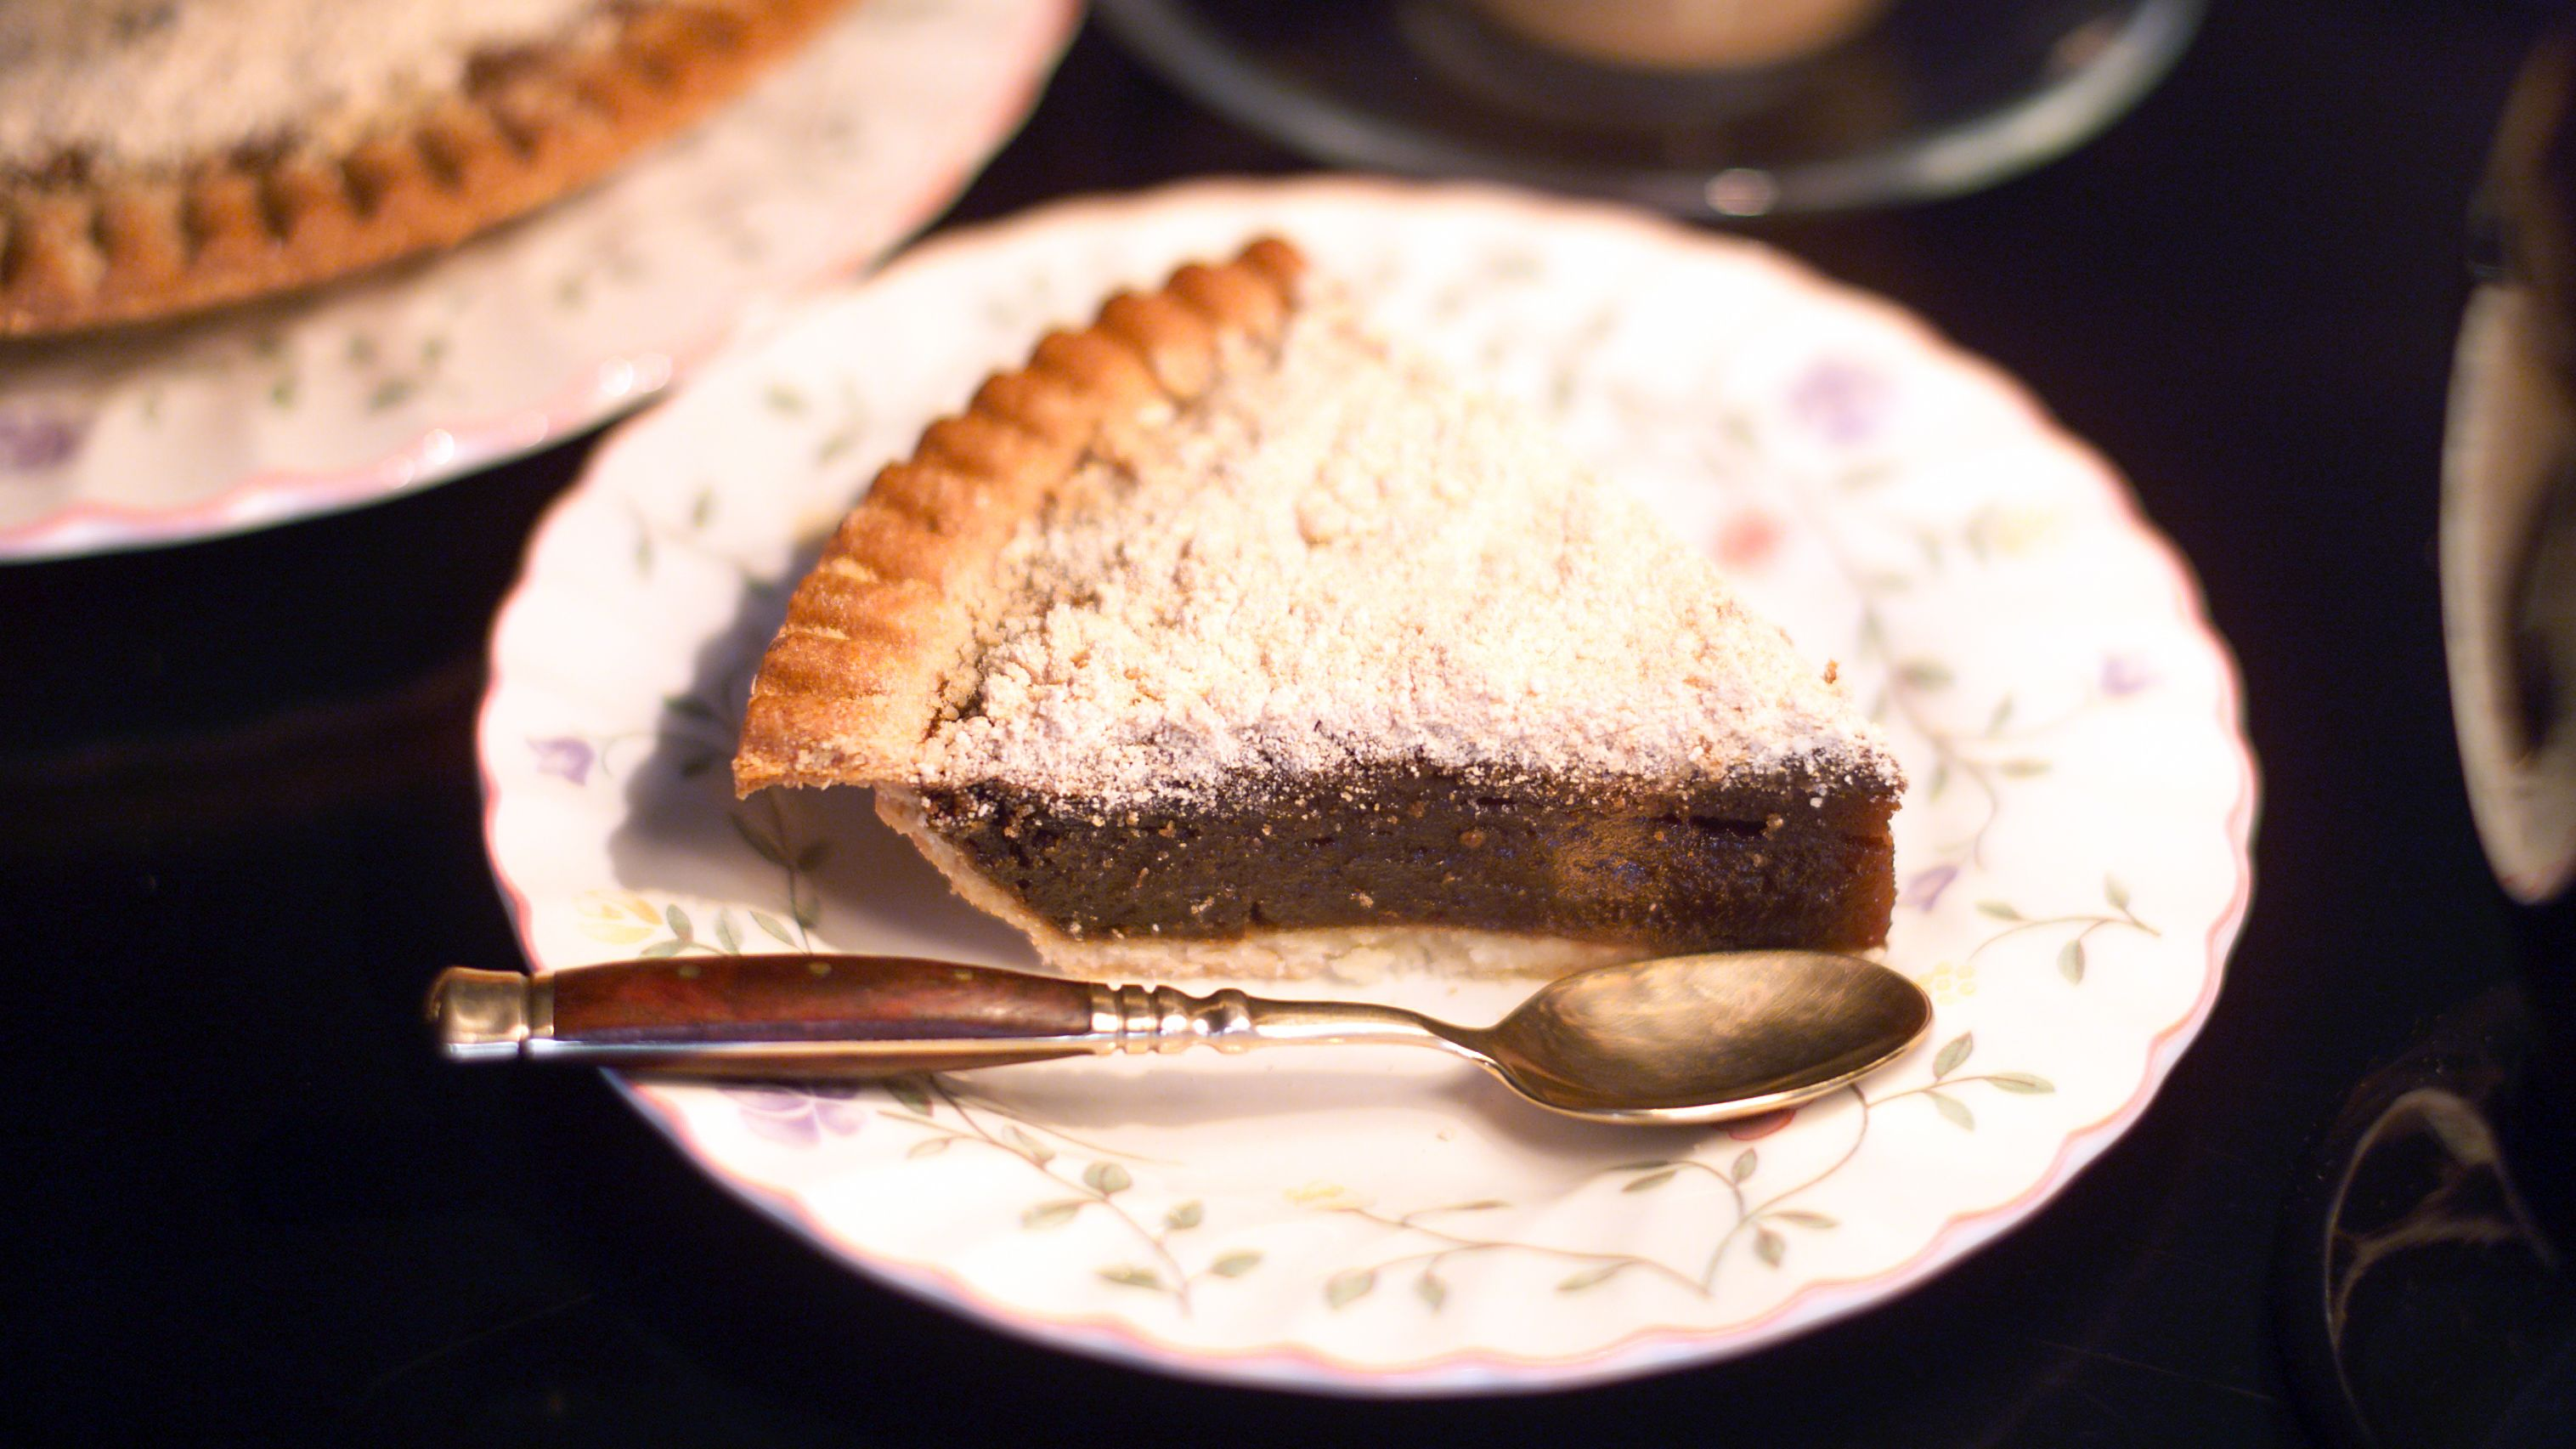 8 Forgotten Pie Recipes We Should Bring Back